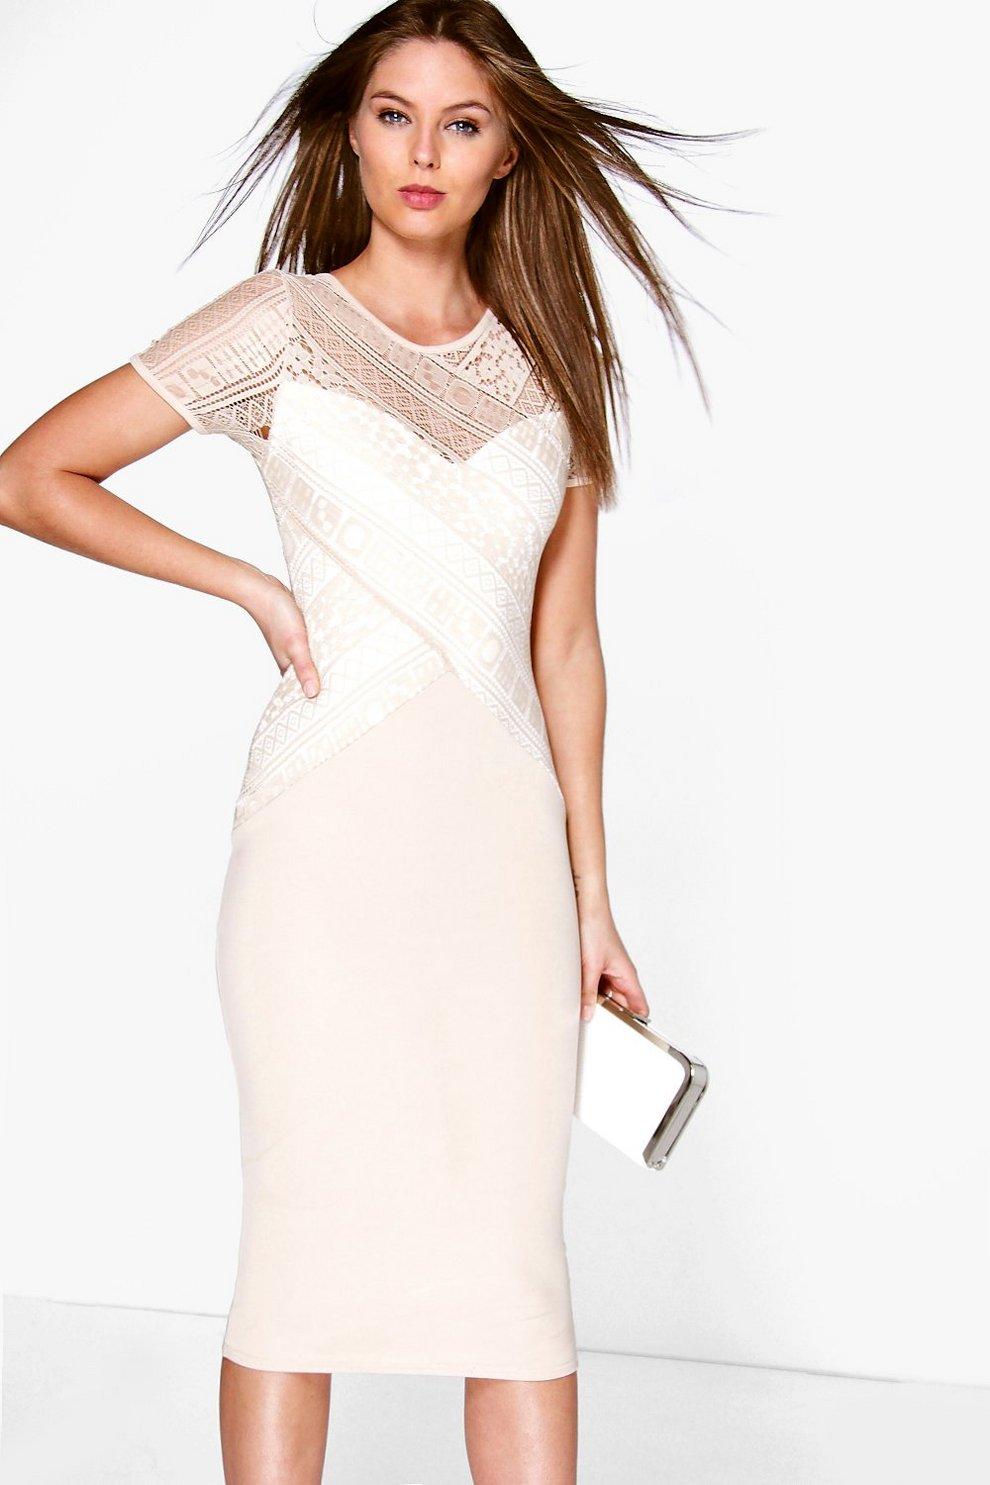 61239d04a769 Rebecca Lace Panel Contrast Midi Dress | Boohoo